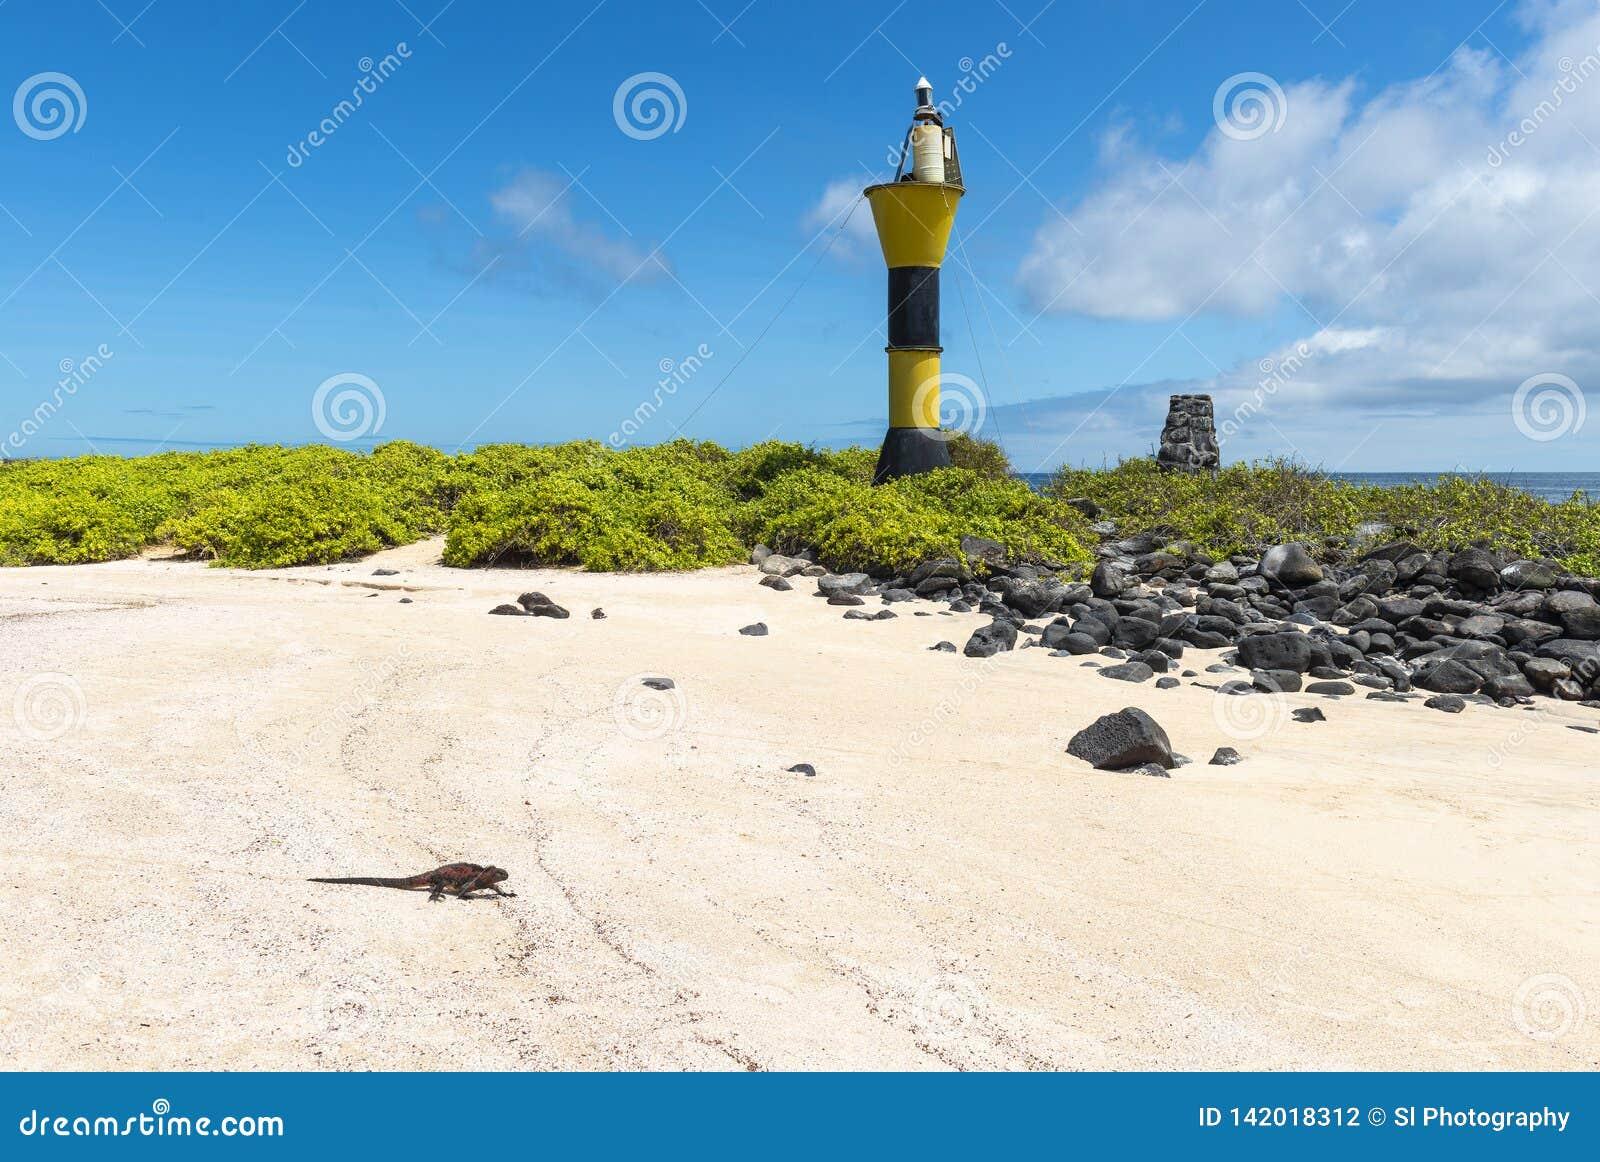 Маяк на острове Espanola, Галапагос, эквадоре